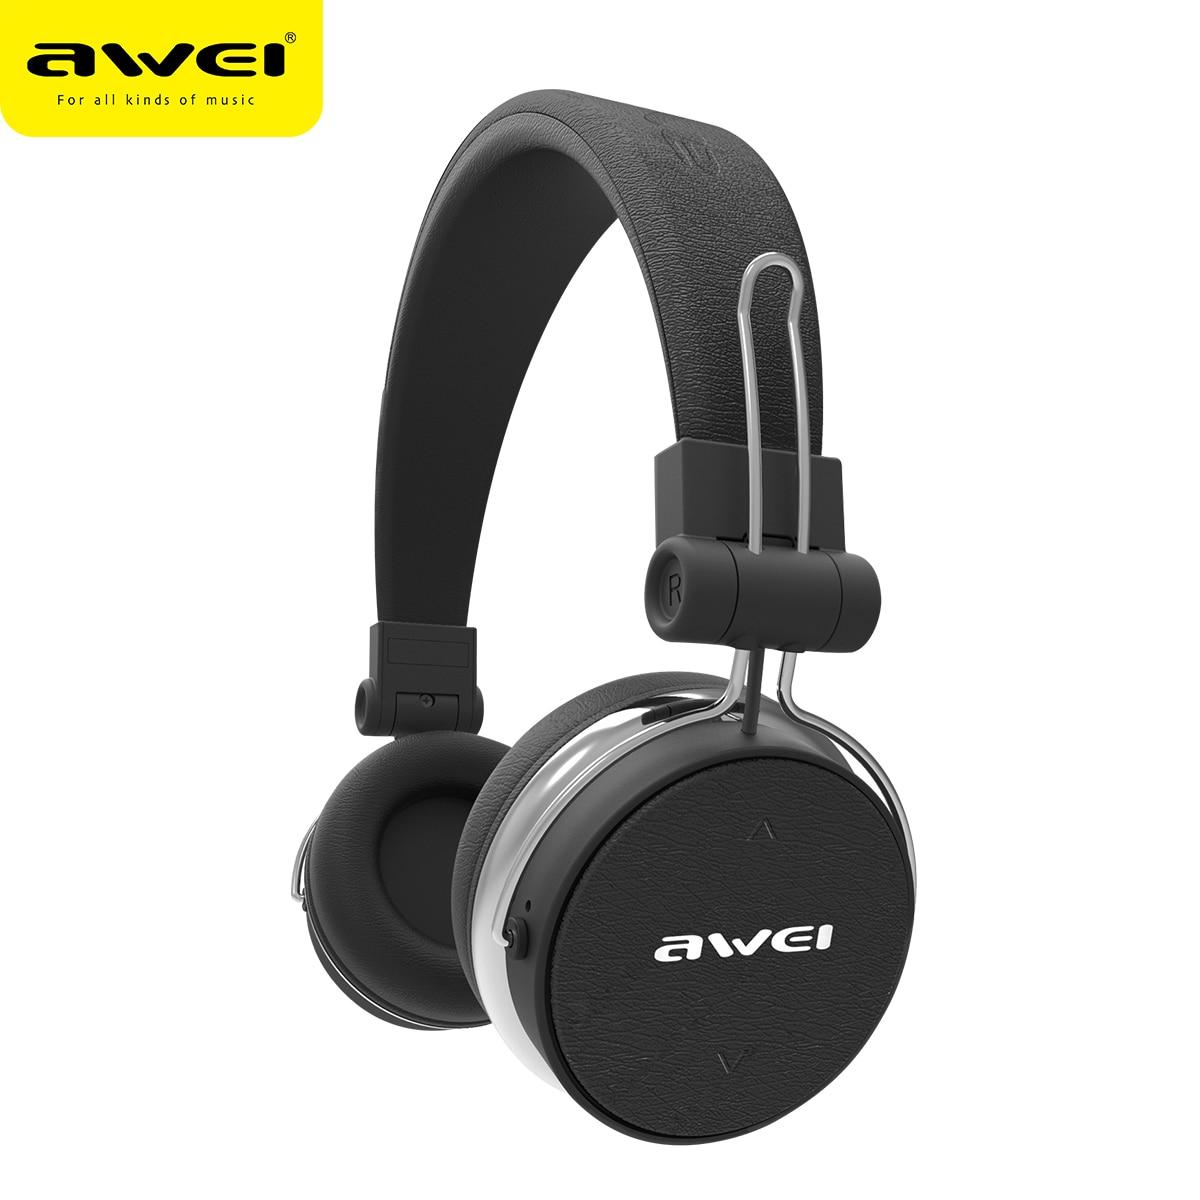 AWEI A700BL Bluetooth Headphone With Microphone Wireless Earphone Cordless Headset Casque Earpiece For Cellphone Stereo Kulakl k